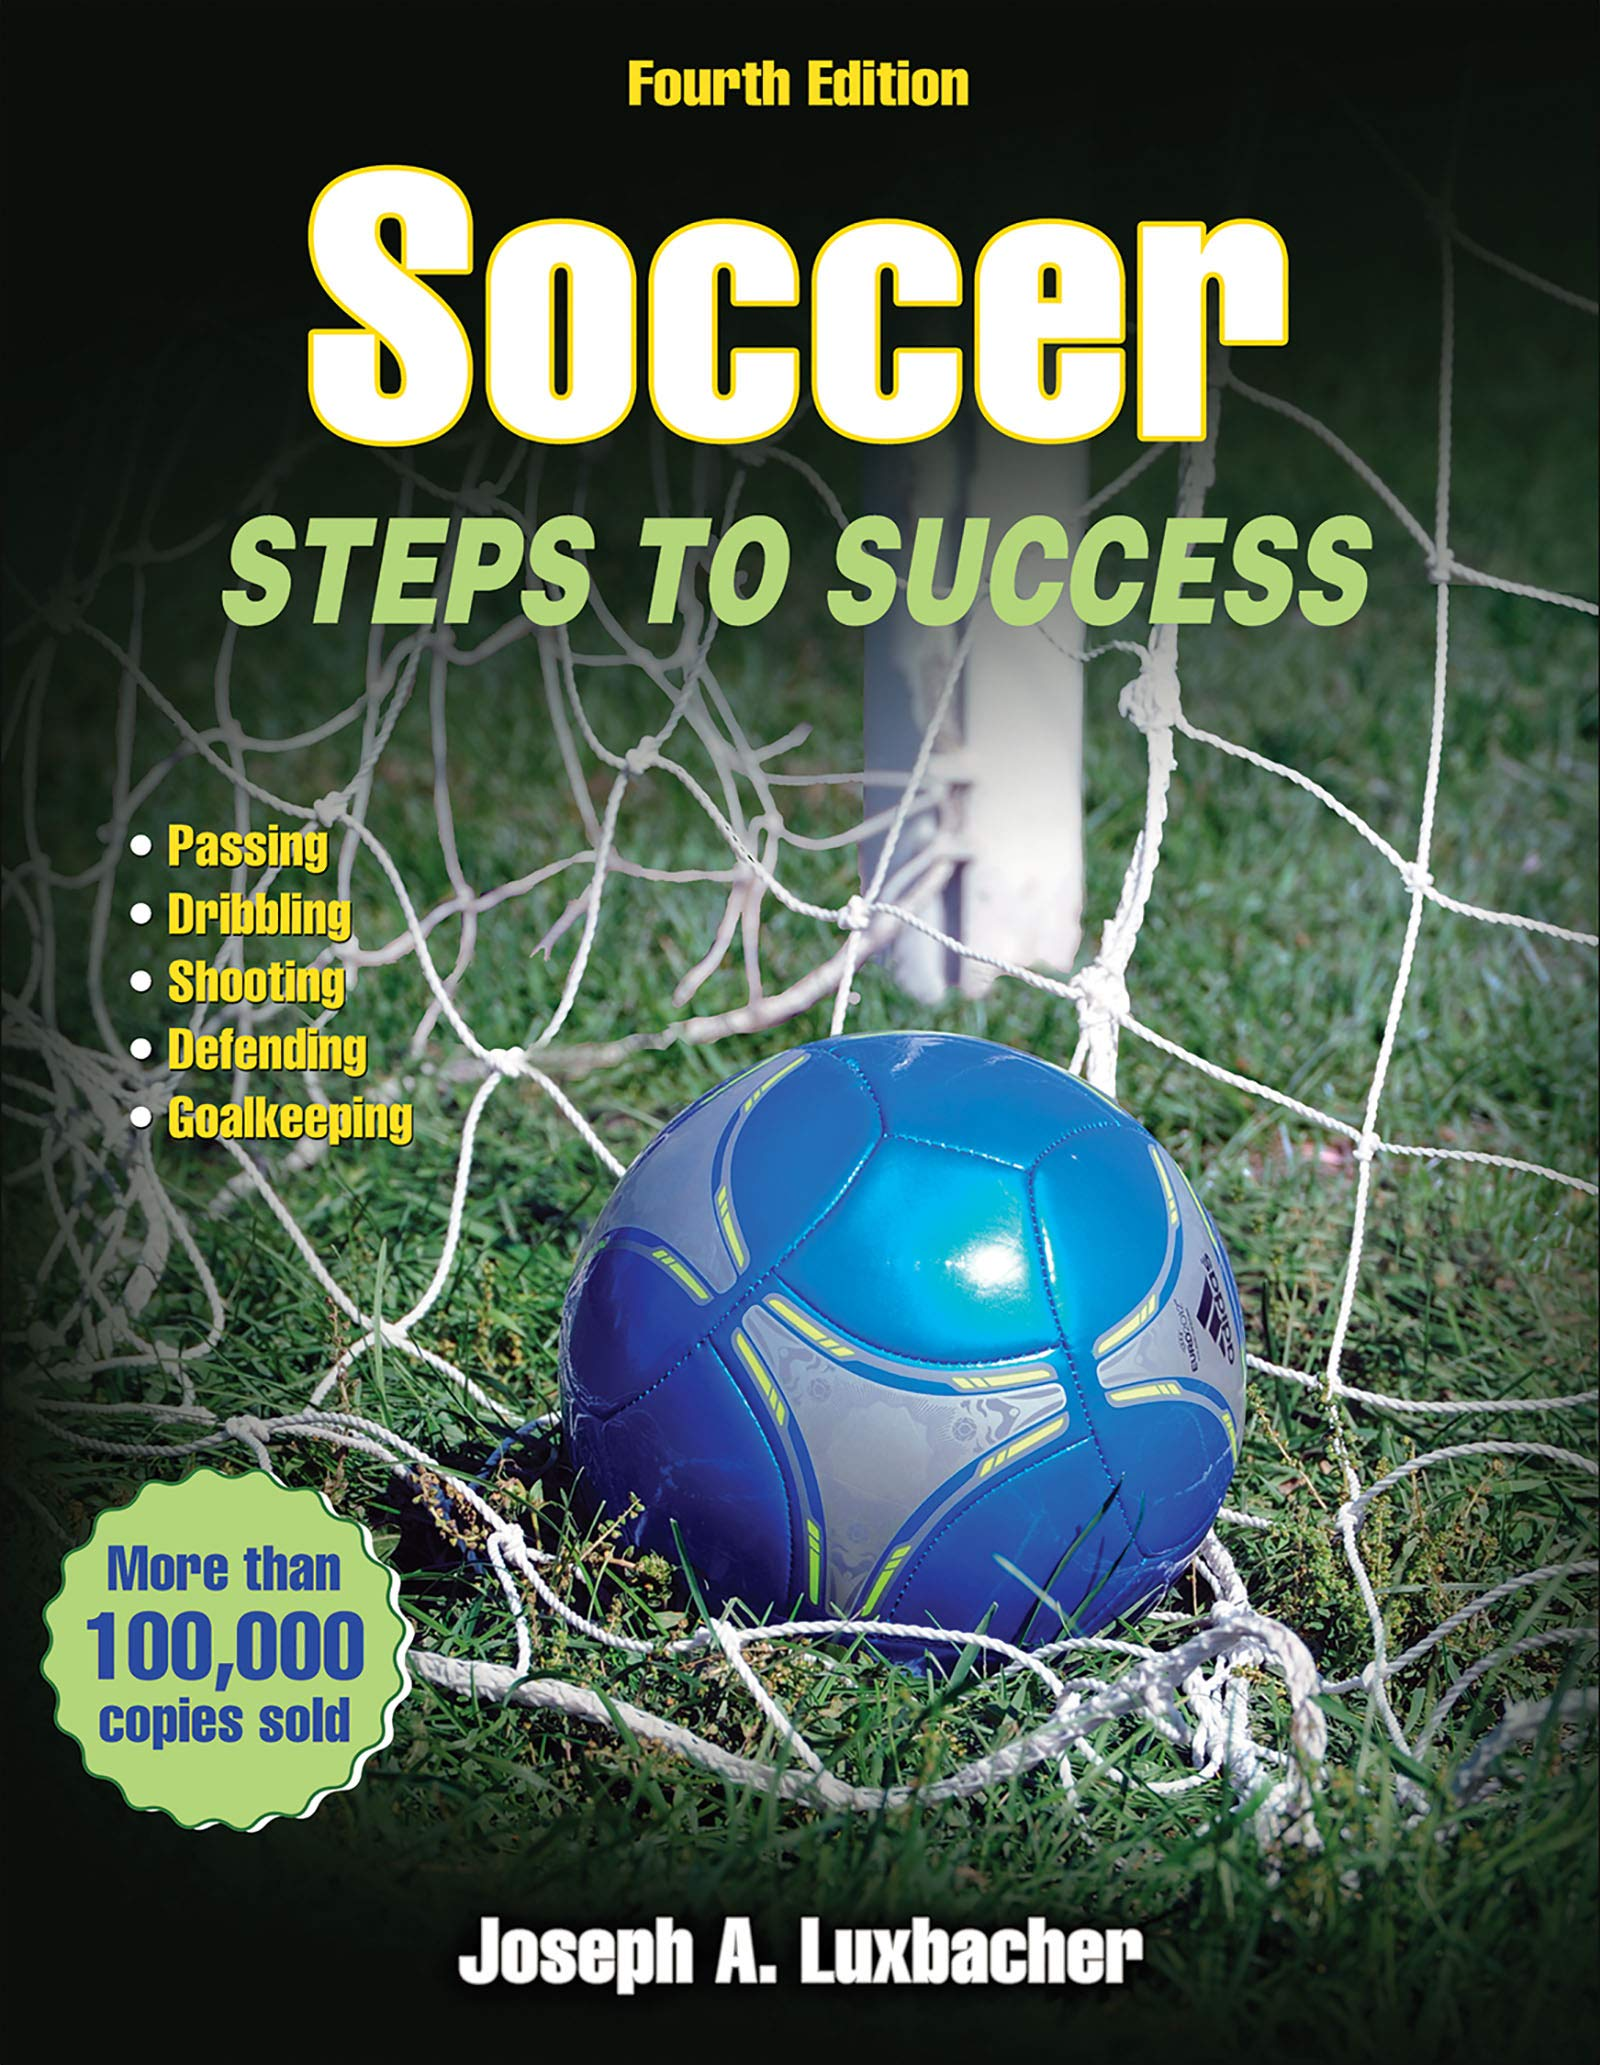 Soccer Steps To Success Sts Steps To Success Activity Luxbacher Joseph A Luxbacher Joseph 9781450435420 Amazon Com Books